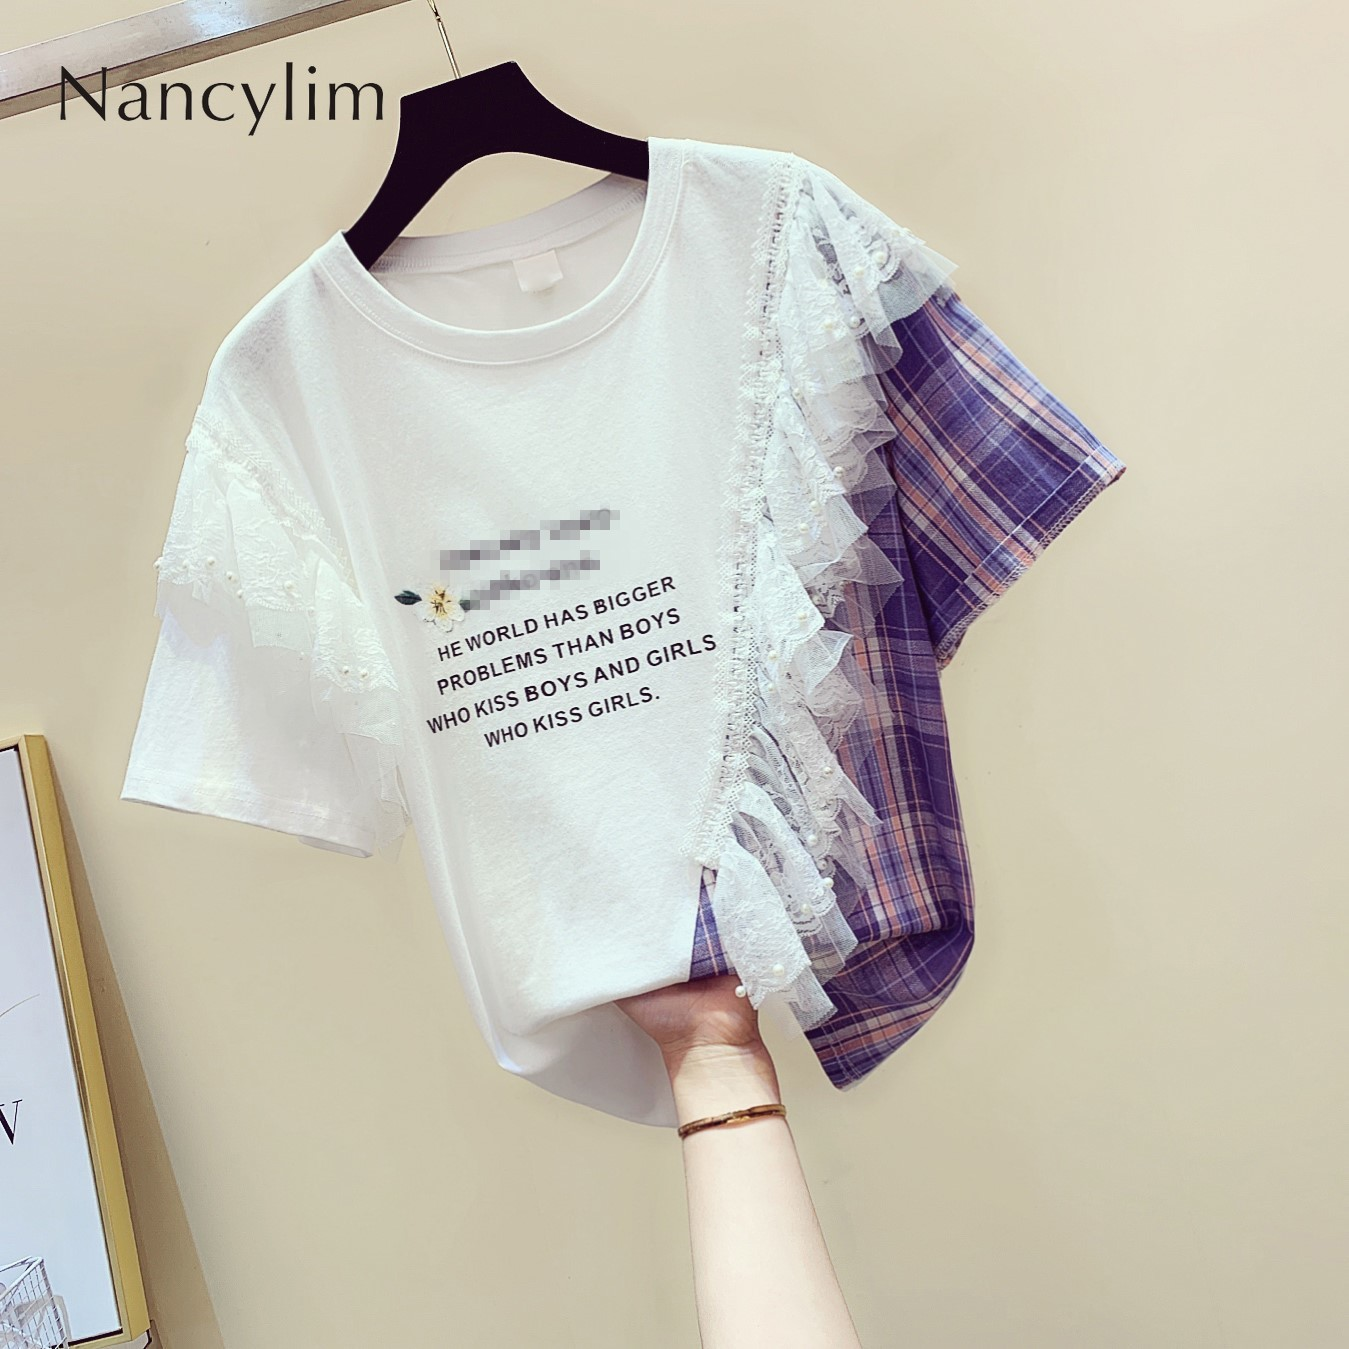 Summer Sweet Pull Shirt Tshirt Women Aesthetics Wind Irregular Lace Stitching Lotus Edge Sleeve Short Sleeve T-shirt Top Student